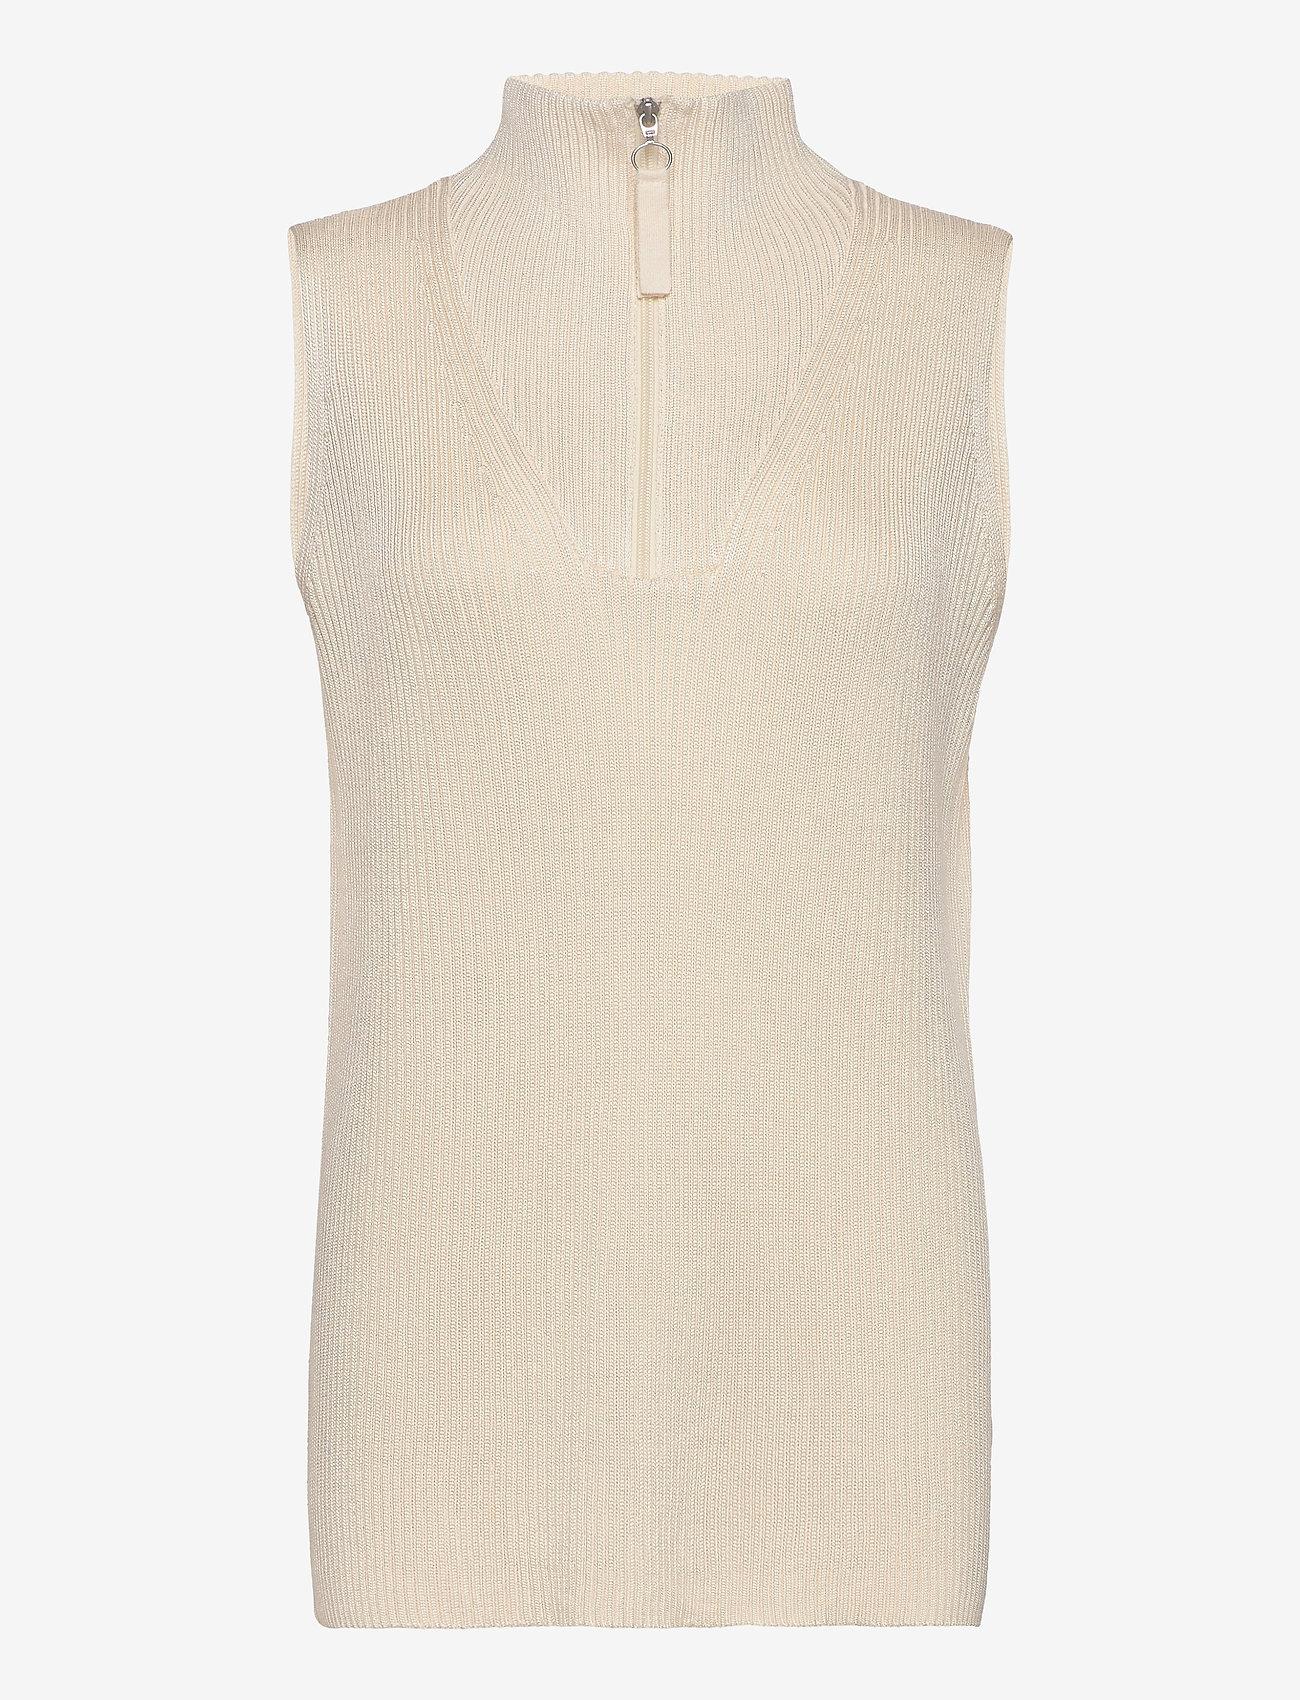 RODEBJER - RODEBJER LADA - knitted vests - ceramic white - 0